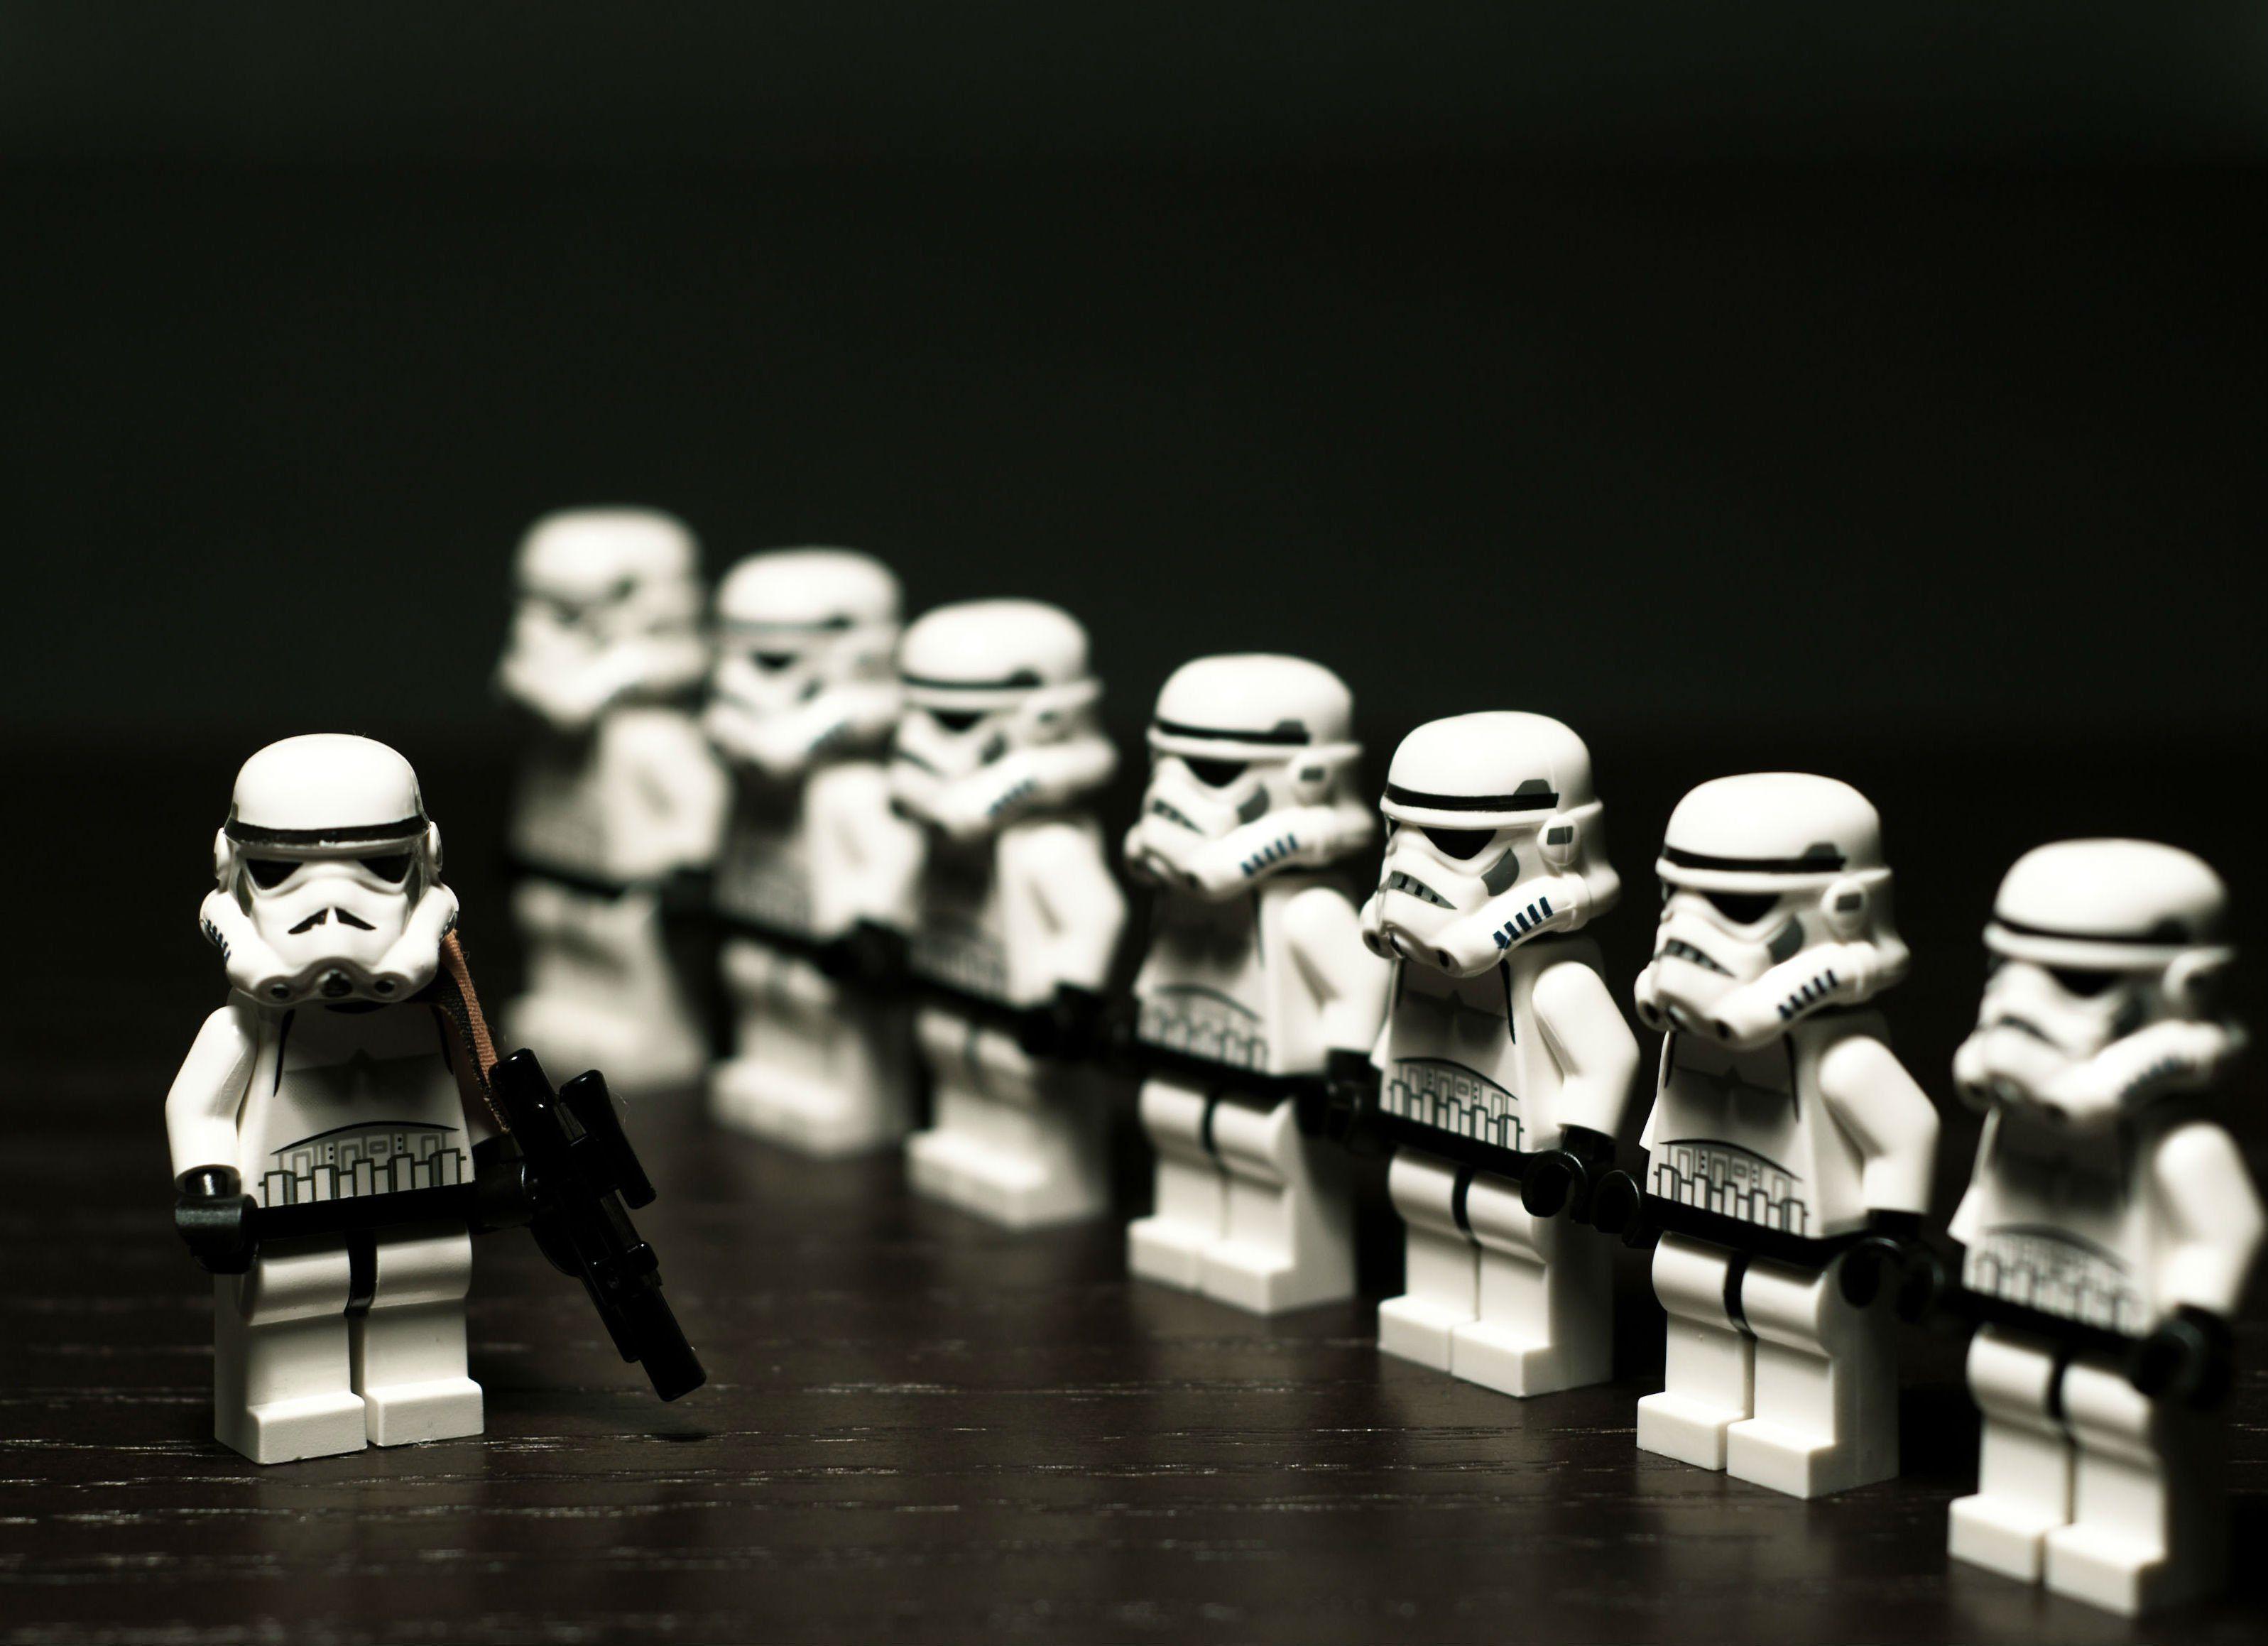 Lego Star Wars Wallpaper High Resolution Free Download